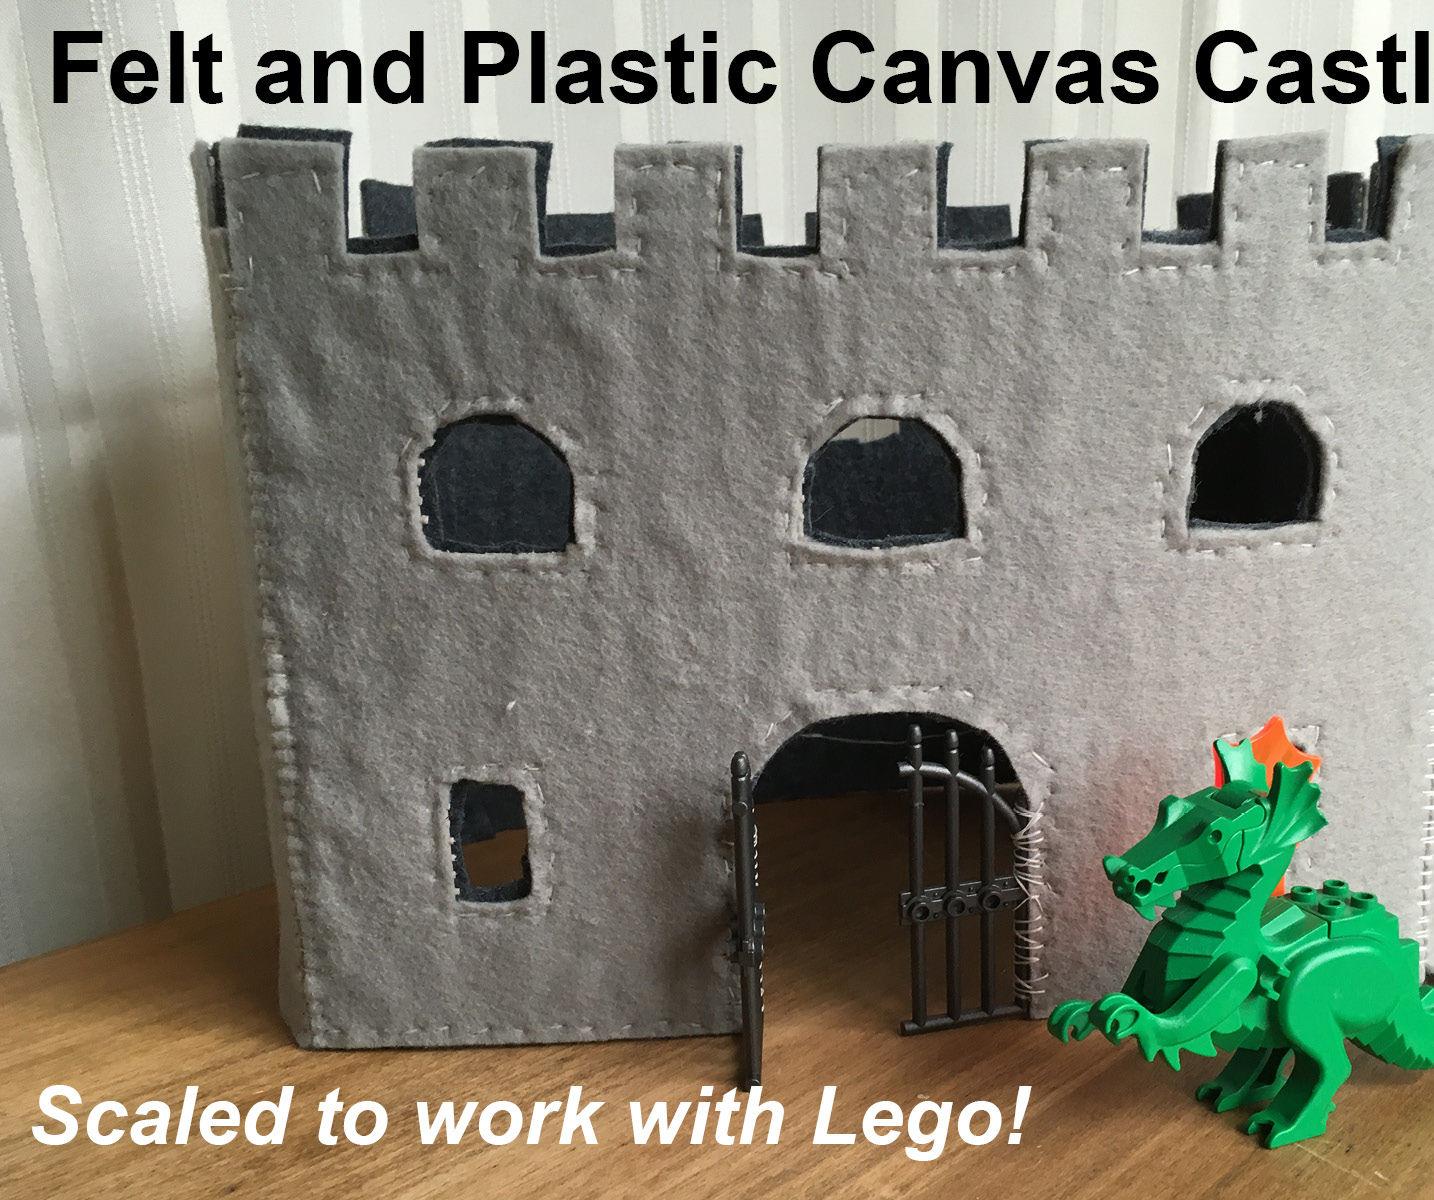 Felt and Plastic Canvas Castle